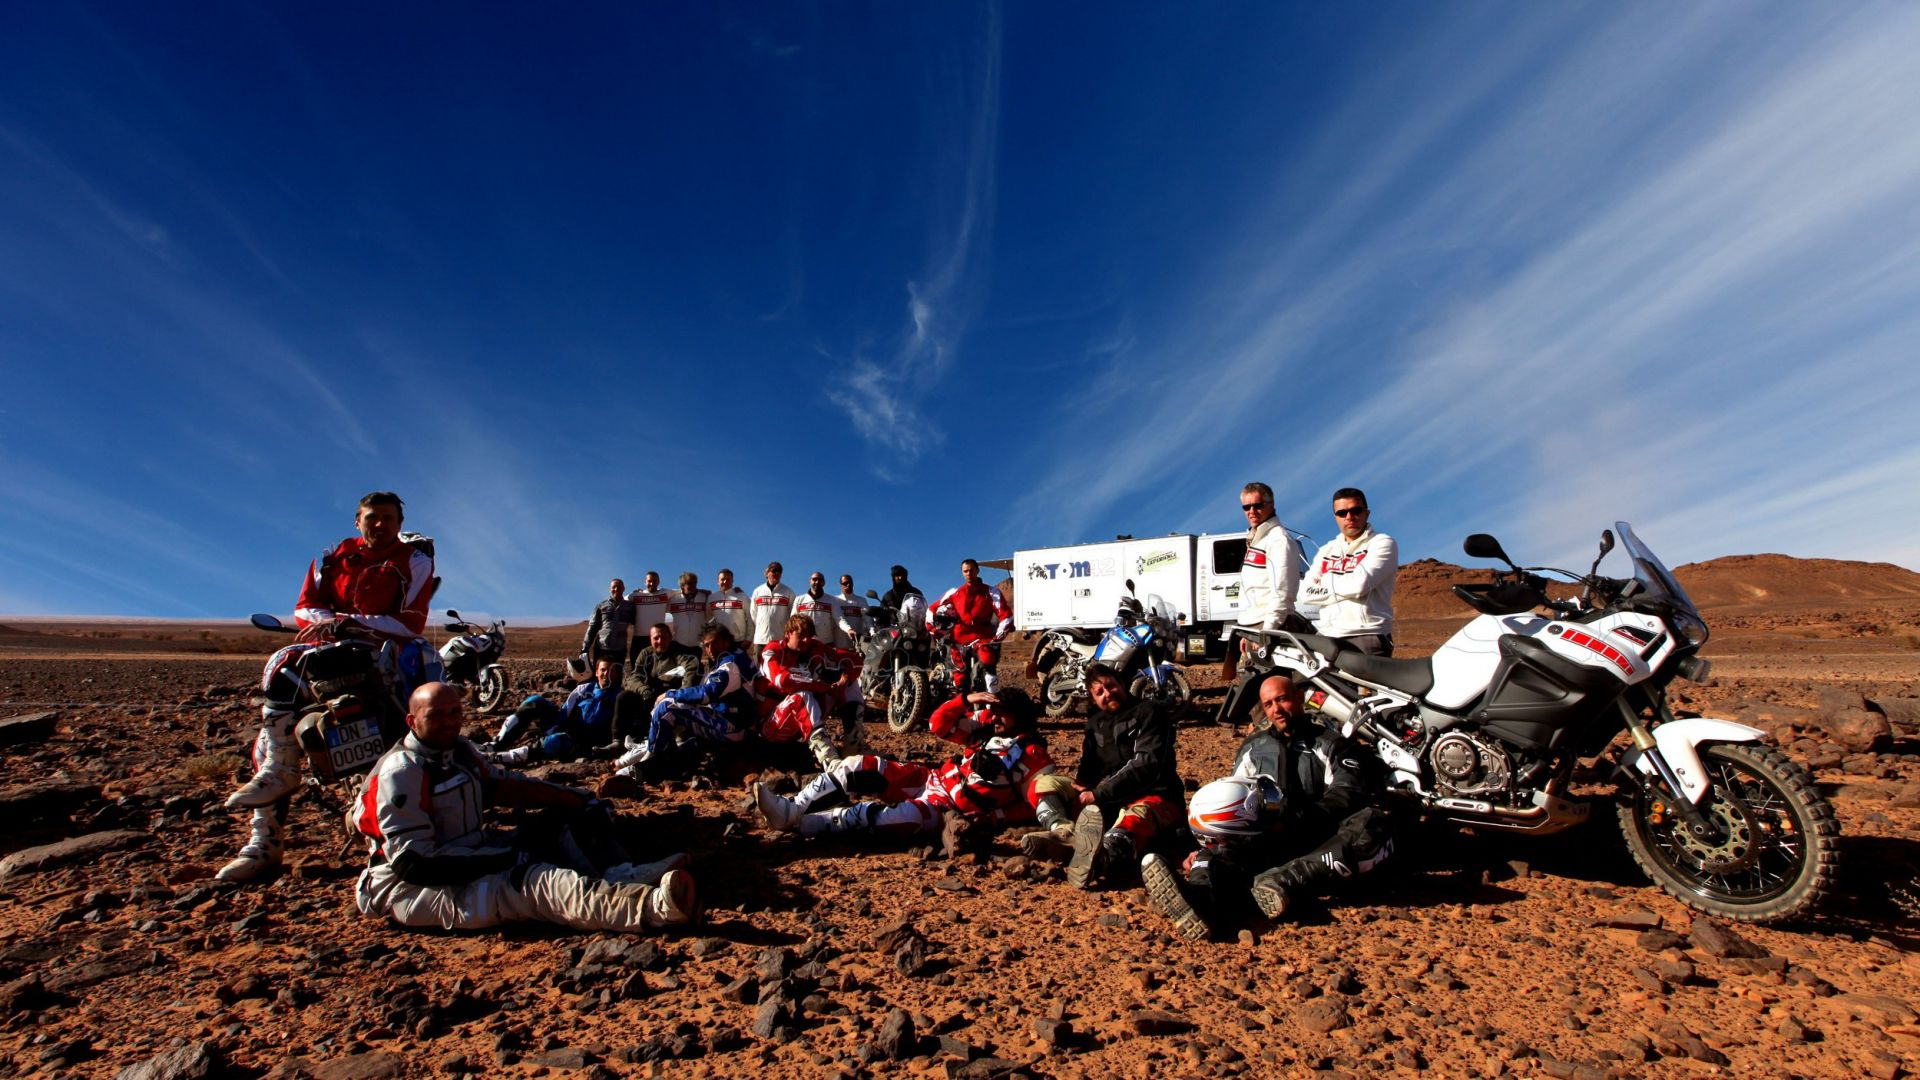 Immagine 75: In Marocco con la Yamaha Super Ténéré